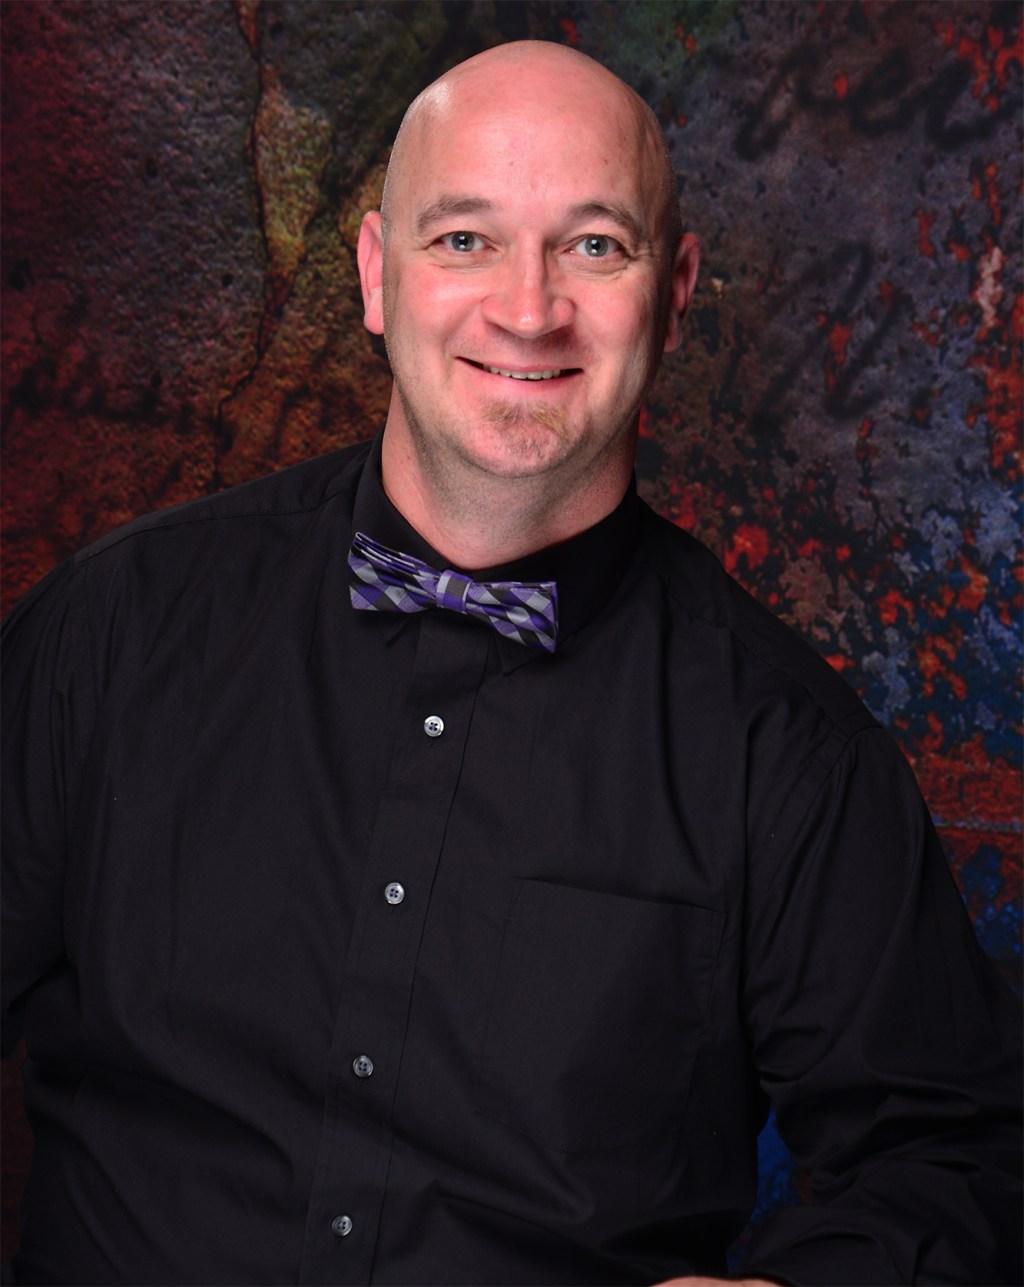 NCCE Member Highlights: Jeff Gearhart